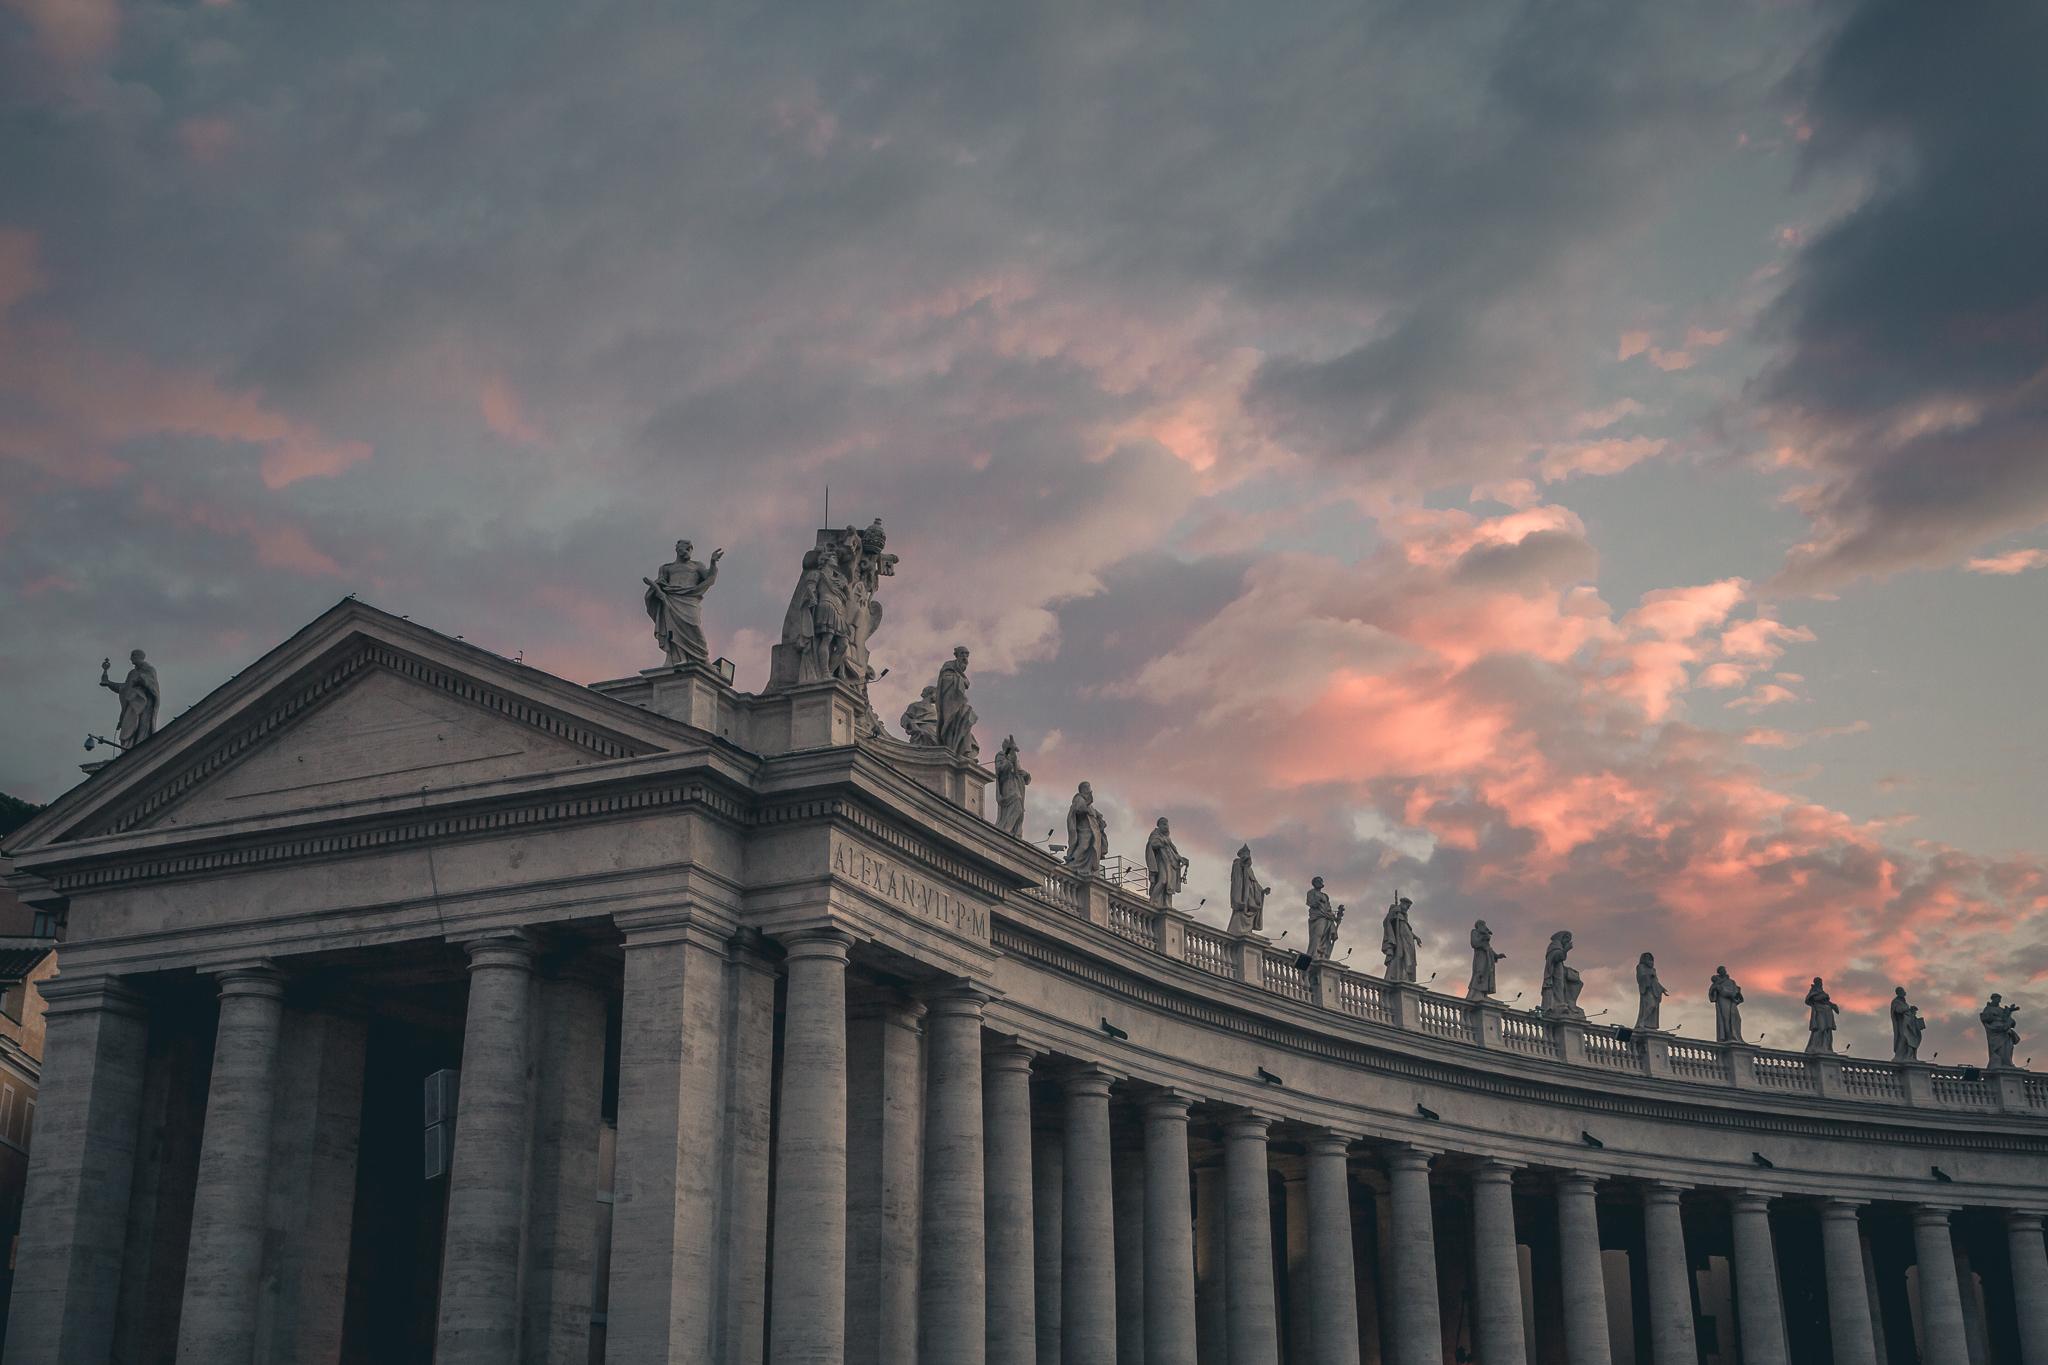 Roma_2048-0008.jpg